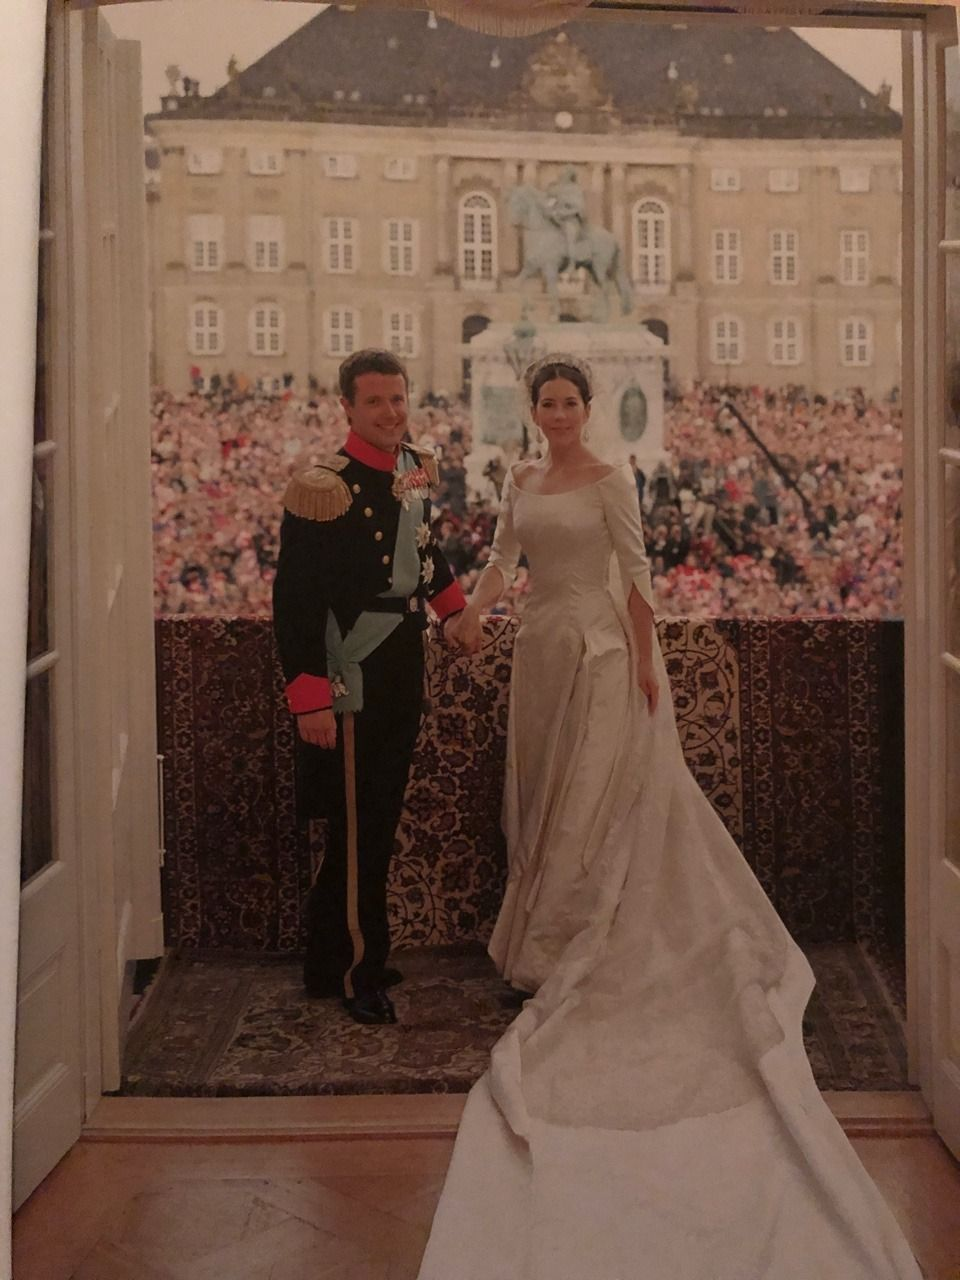 Danish Royal Family Famous Wedding Dresses Royal Wedding Dress Denmark Wedding [ 1280 x 960 Pixel ]